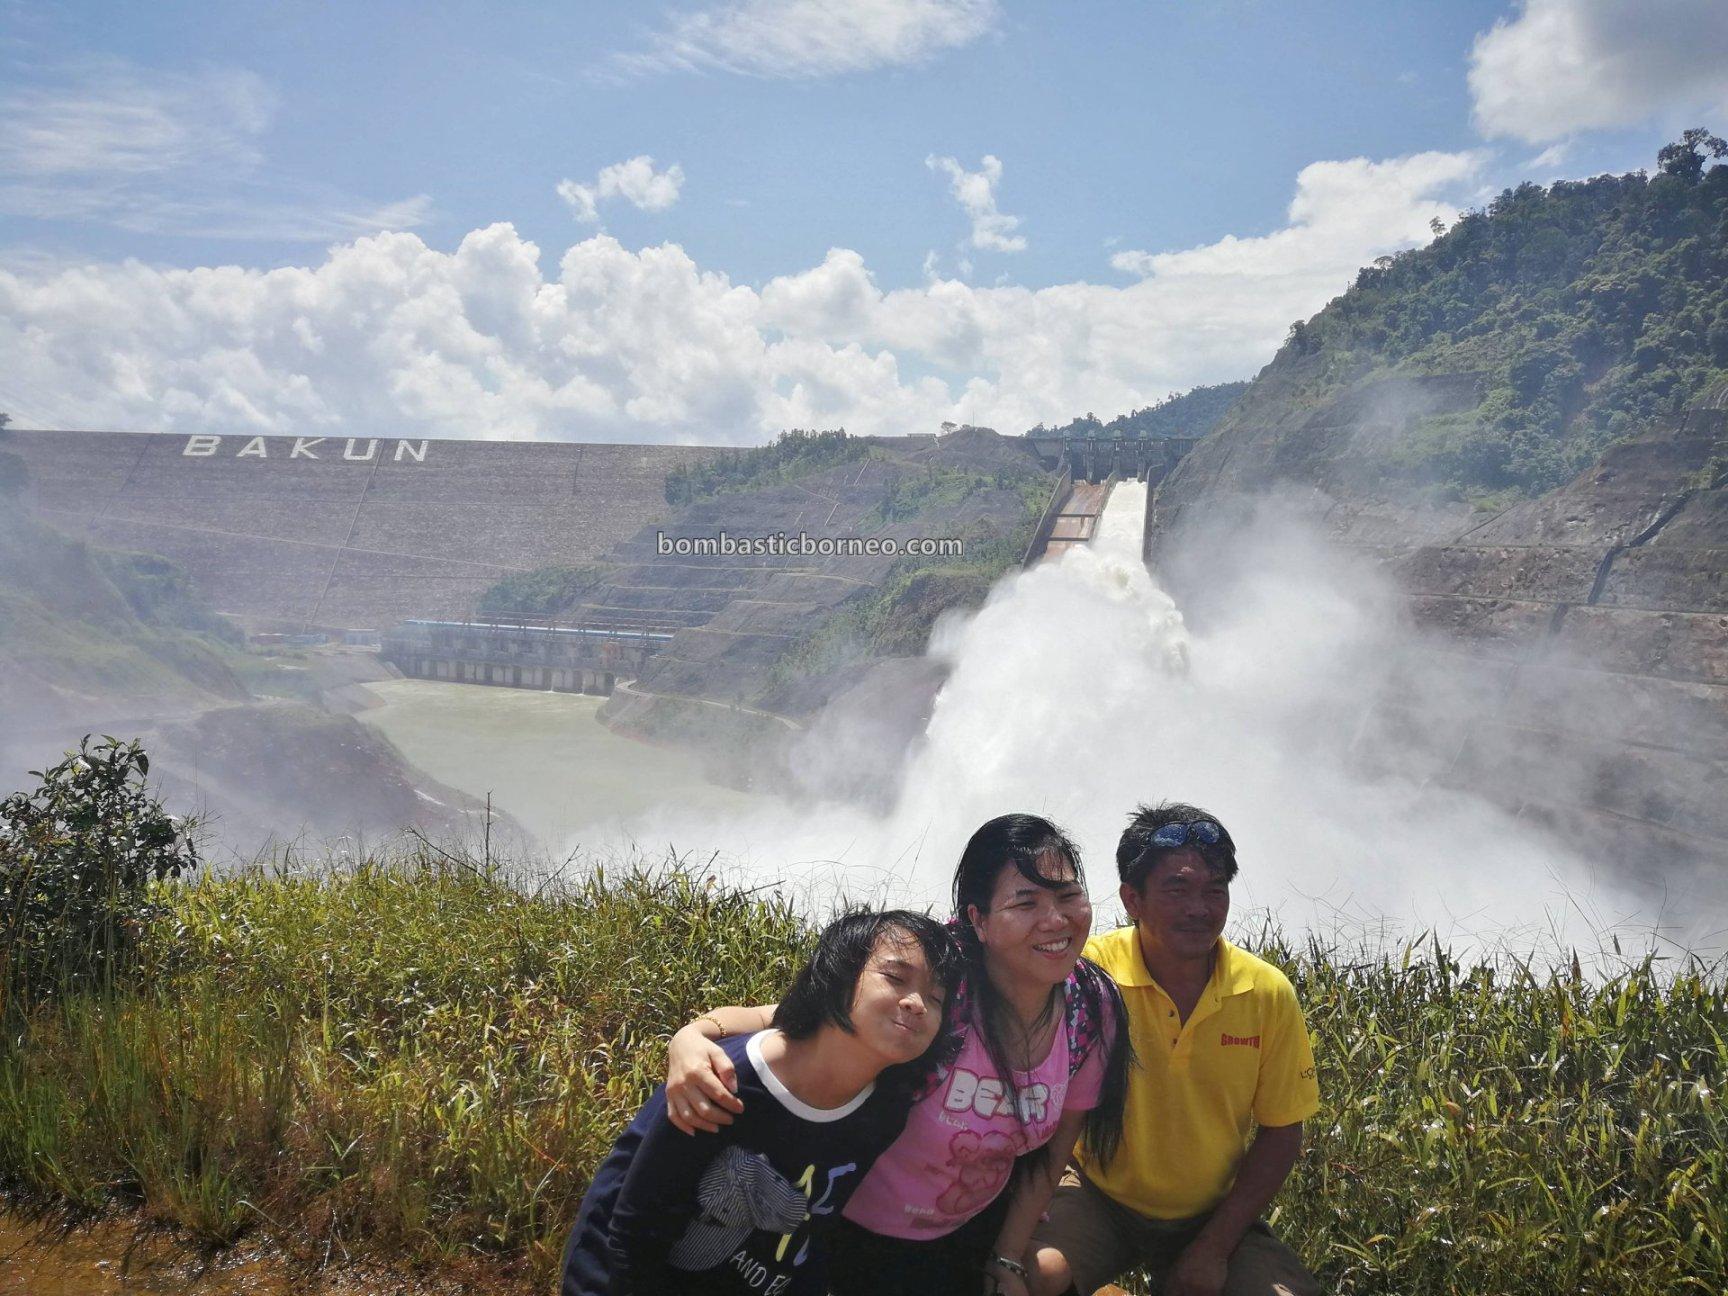 Hydroelectric Power, Embankment Dam, backpackers, destination, Sungai Balui, exotic fish, fishing trip, memancing ikan, wharf, Tourism, tourist attraction, Trans Border, 探索婆罗洲游踪, 砂拉越峇贡水坝, 马来西亚旅游景点